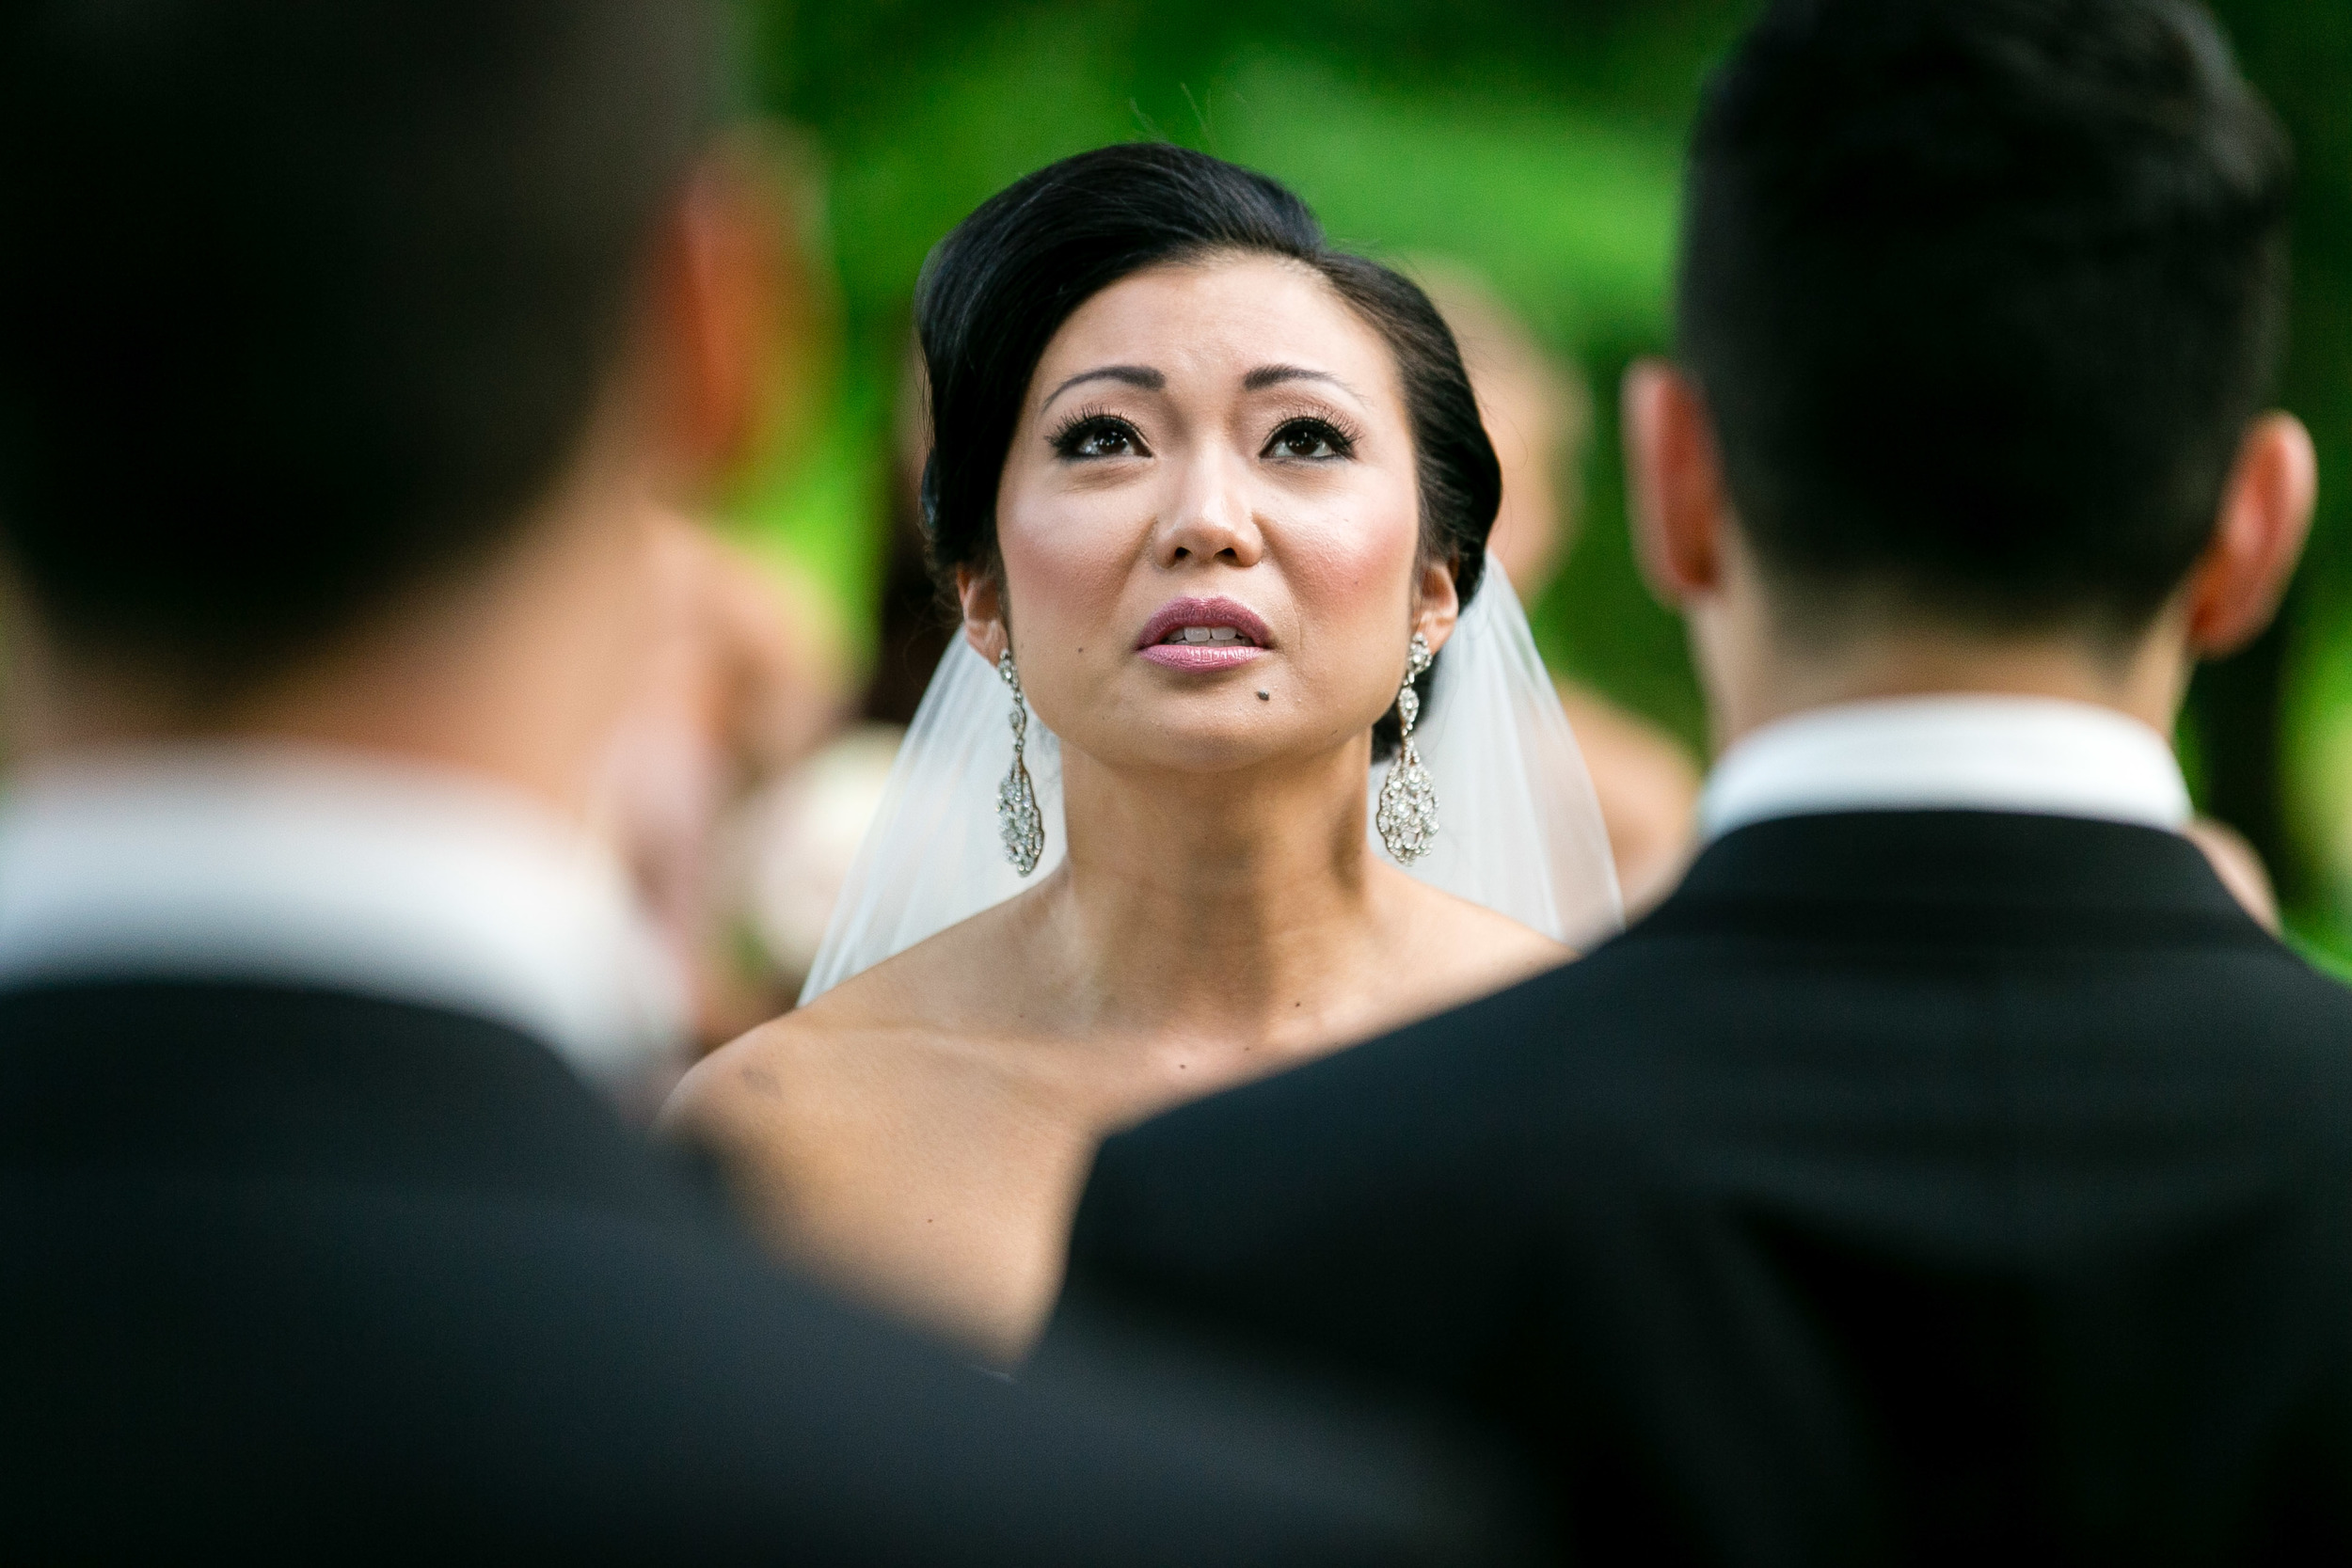 Luxurious-Chinese-Italian-Wedding-Pleasantdale-Chateau-West-Orange-New-Jersey-Photojournalisti-Wedding-Photography-Jacek-Dolata-23.jpg